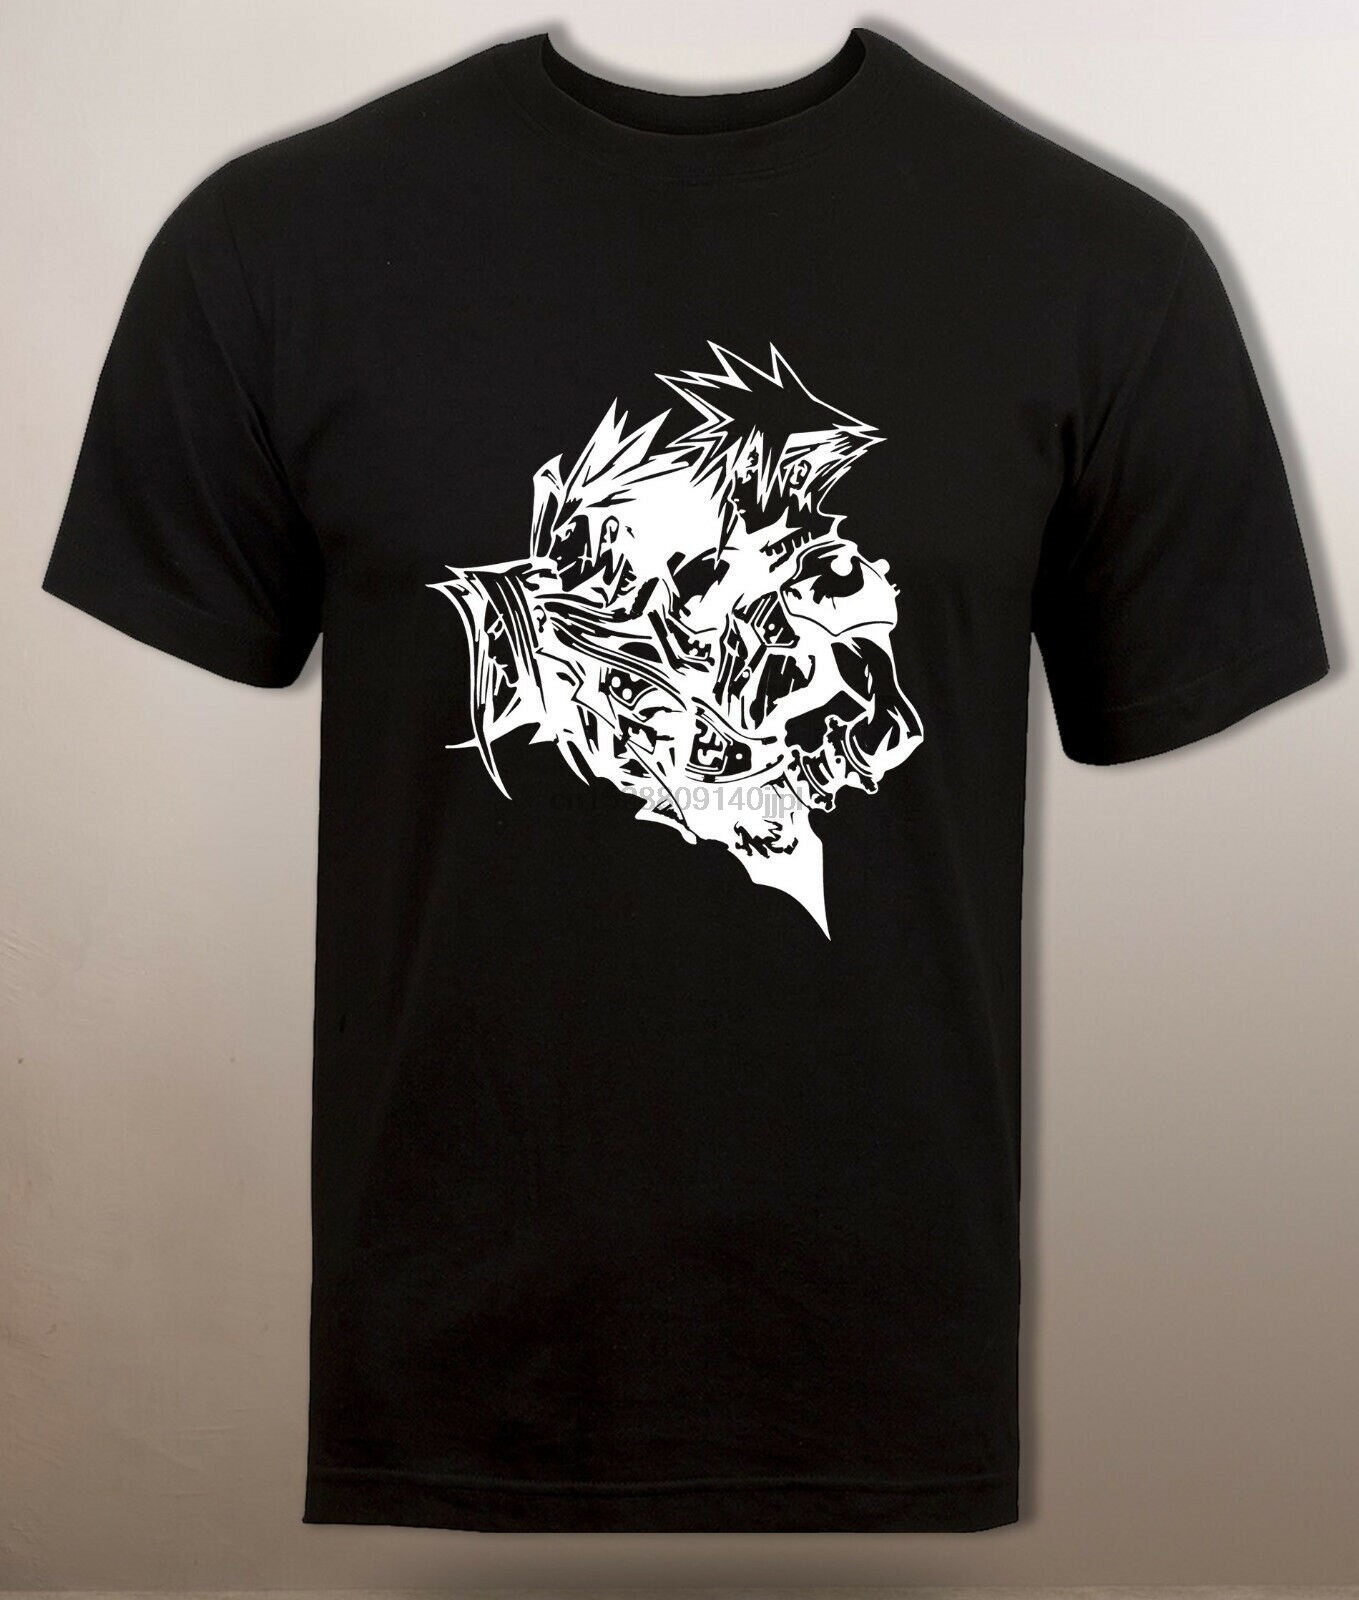 Final Fantasy 7 T camisa Sephiroth Zack justo Cloud Strife T camisa Ff7 Casual orgullo T camisa de los hombres de moda Unisex camiseta